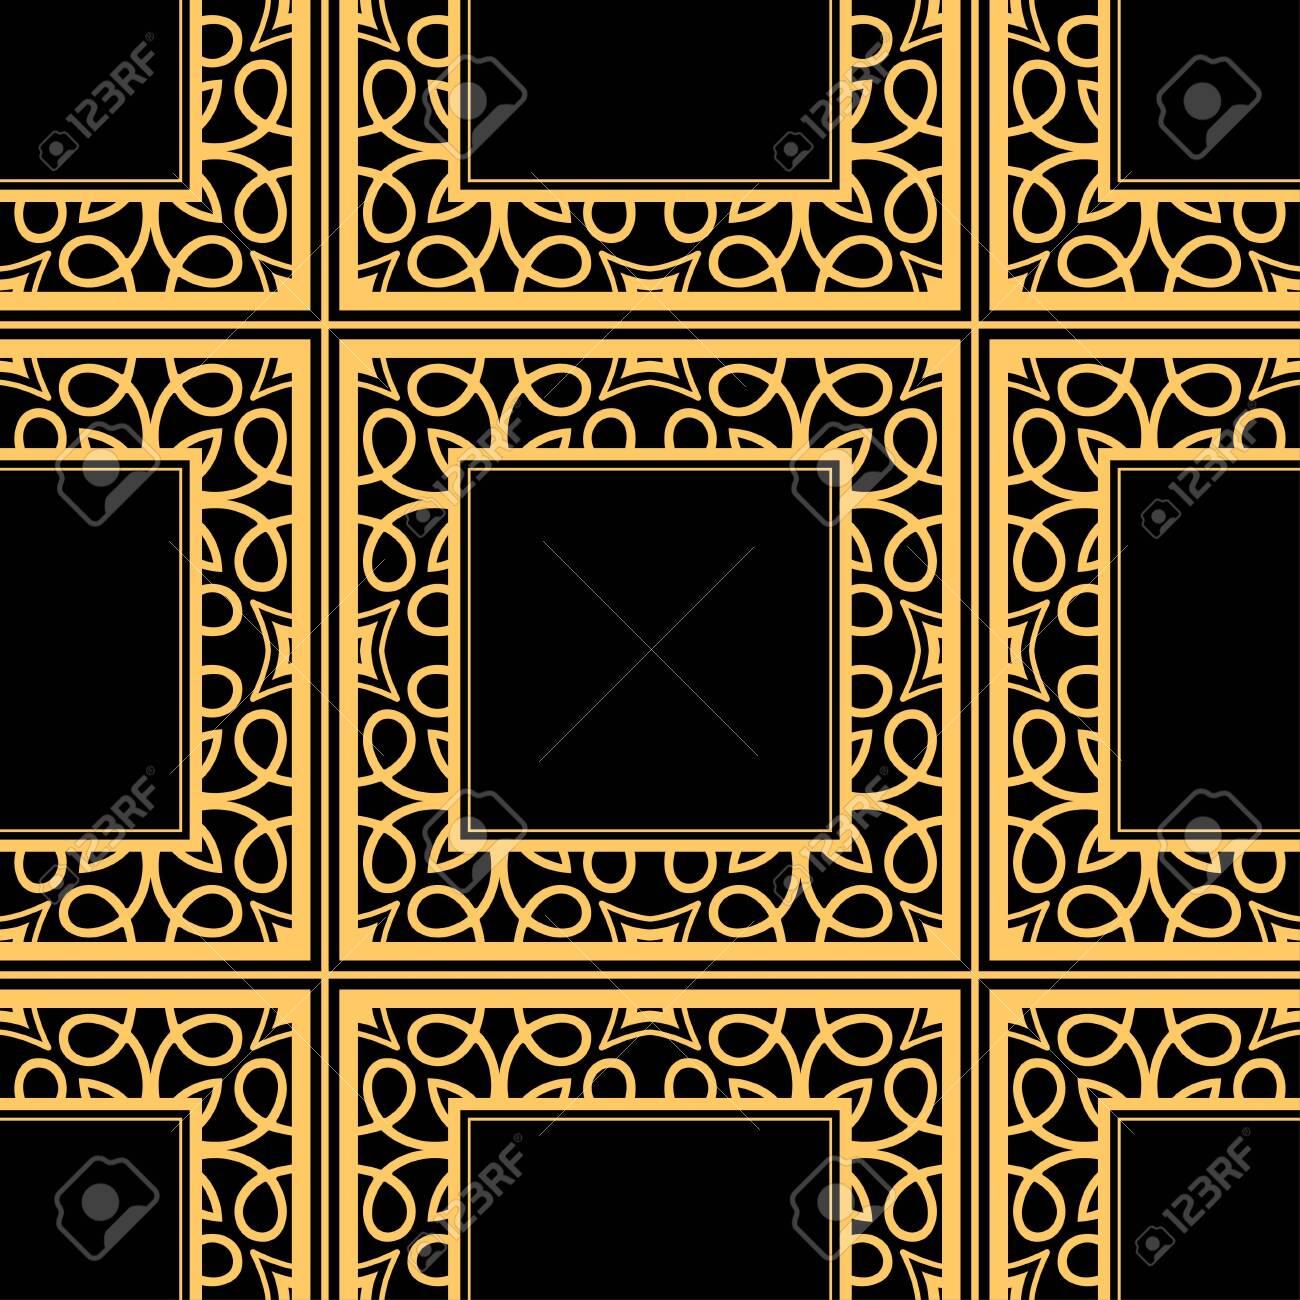 Vintage Golden Ornate Seamless Retro Pattern Modern Art Deco